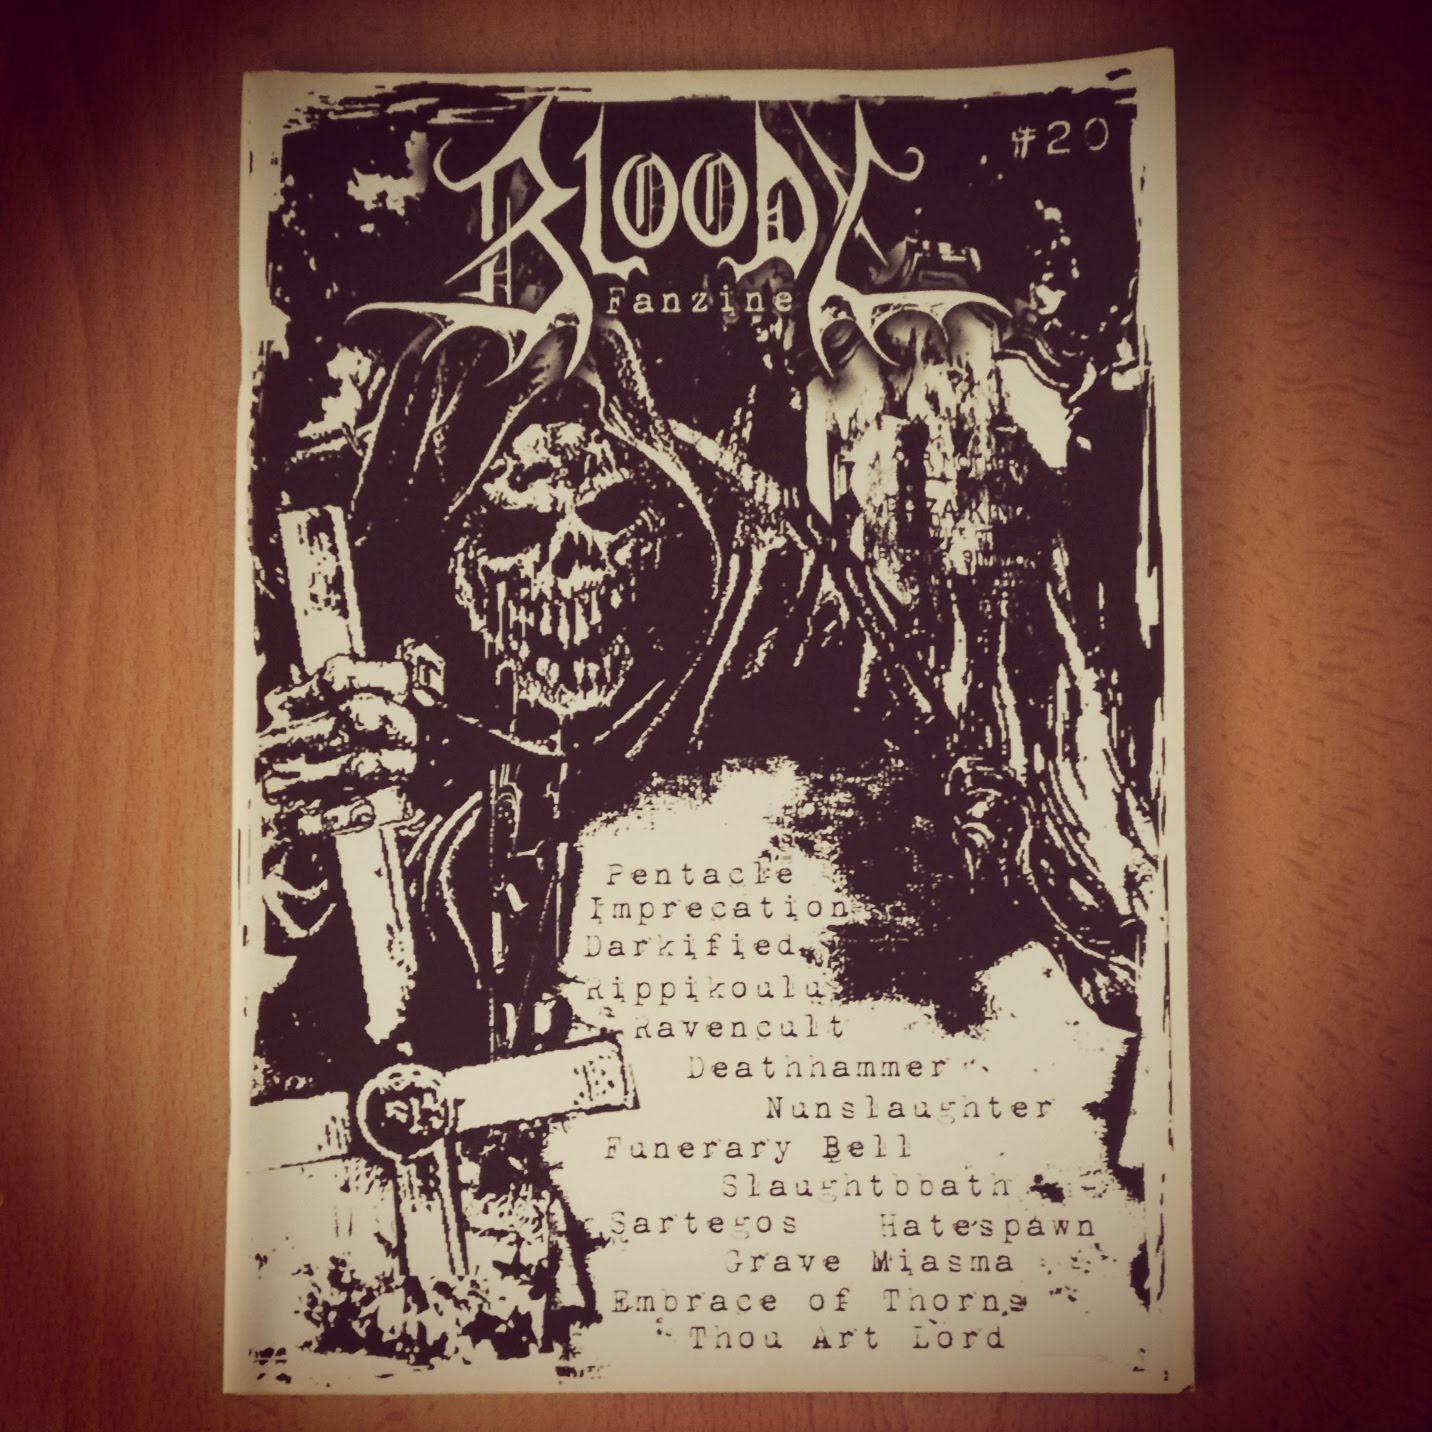 BLOODY FANZINE # 20